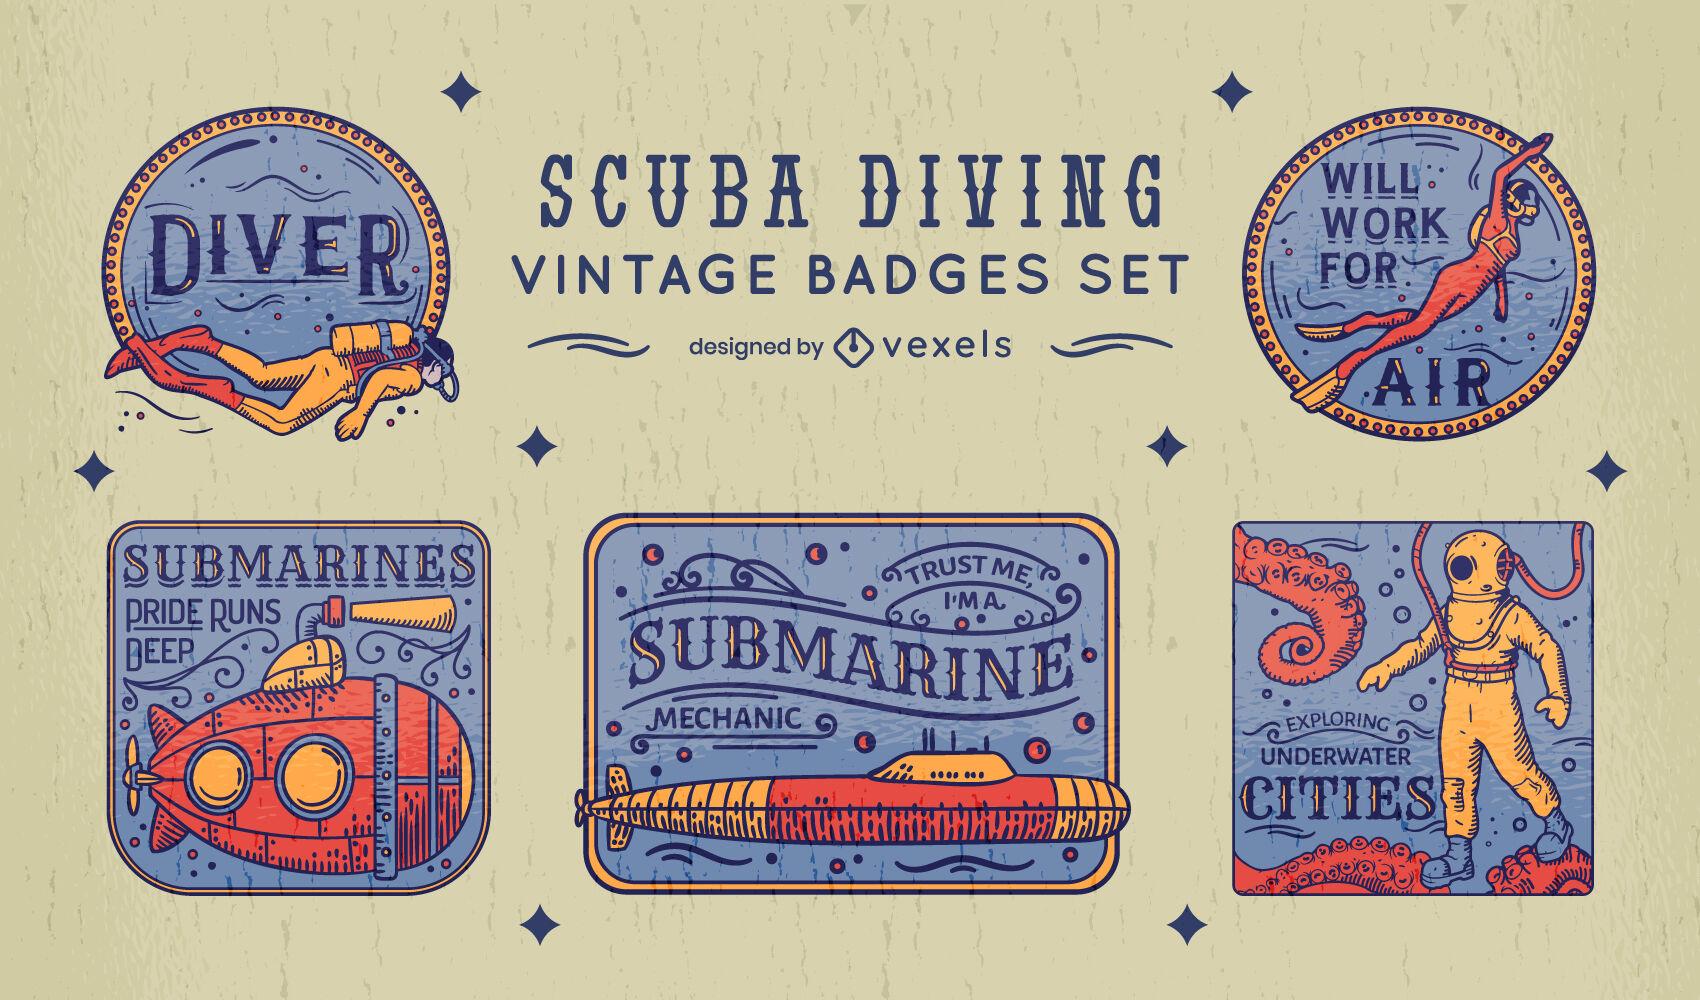 Scuba diving hobby vintage badge set